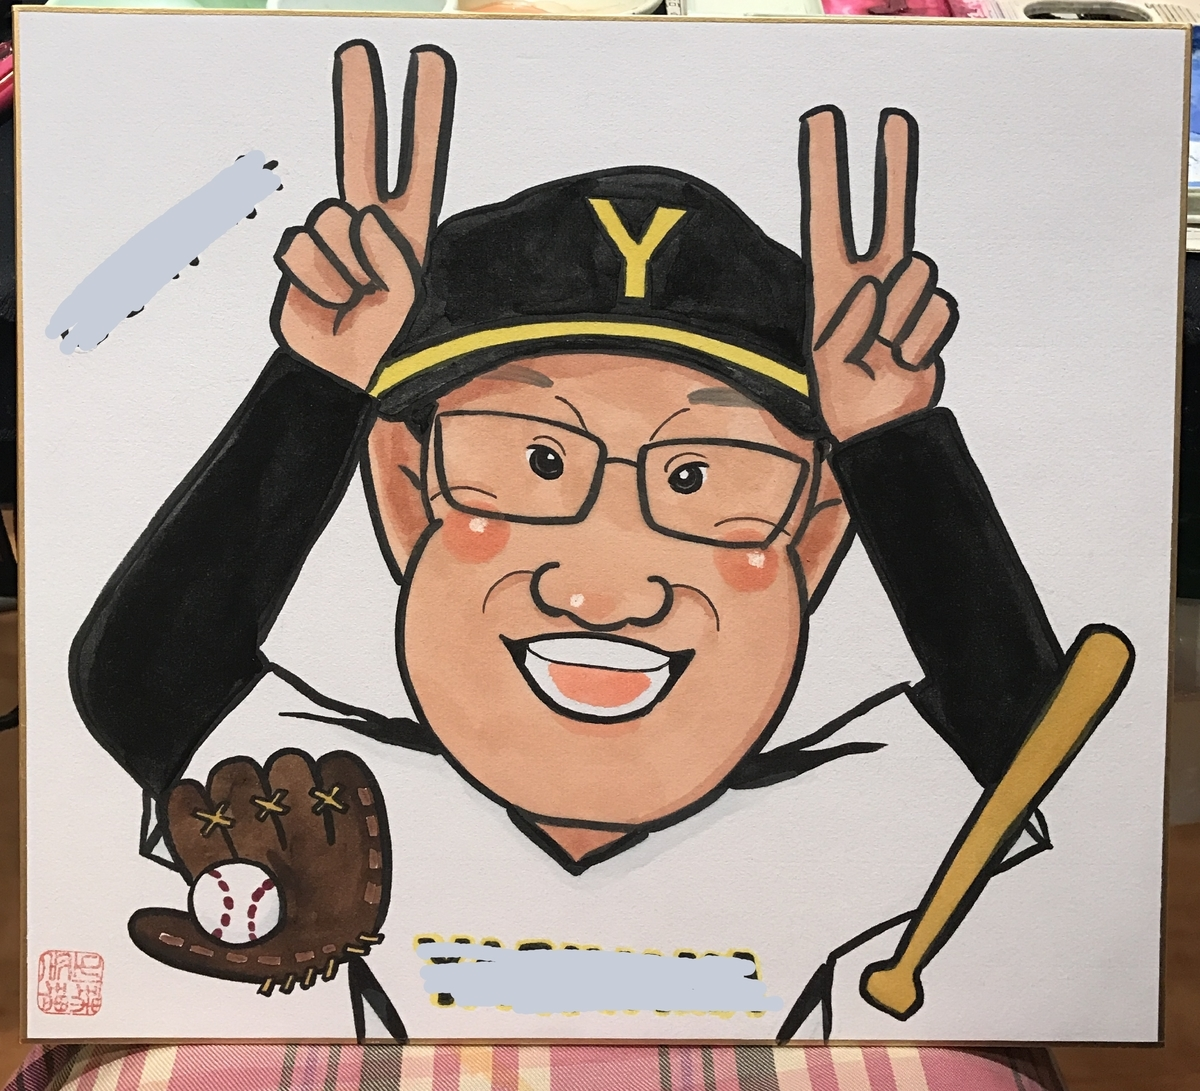 Tシャツ用似顔絵 北海道札幌の似顔絵作家高井じゅり 似顔絵ファクトリー